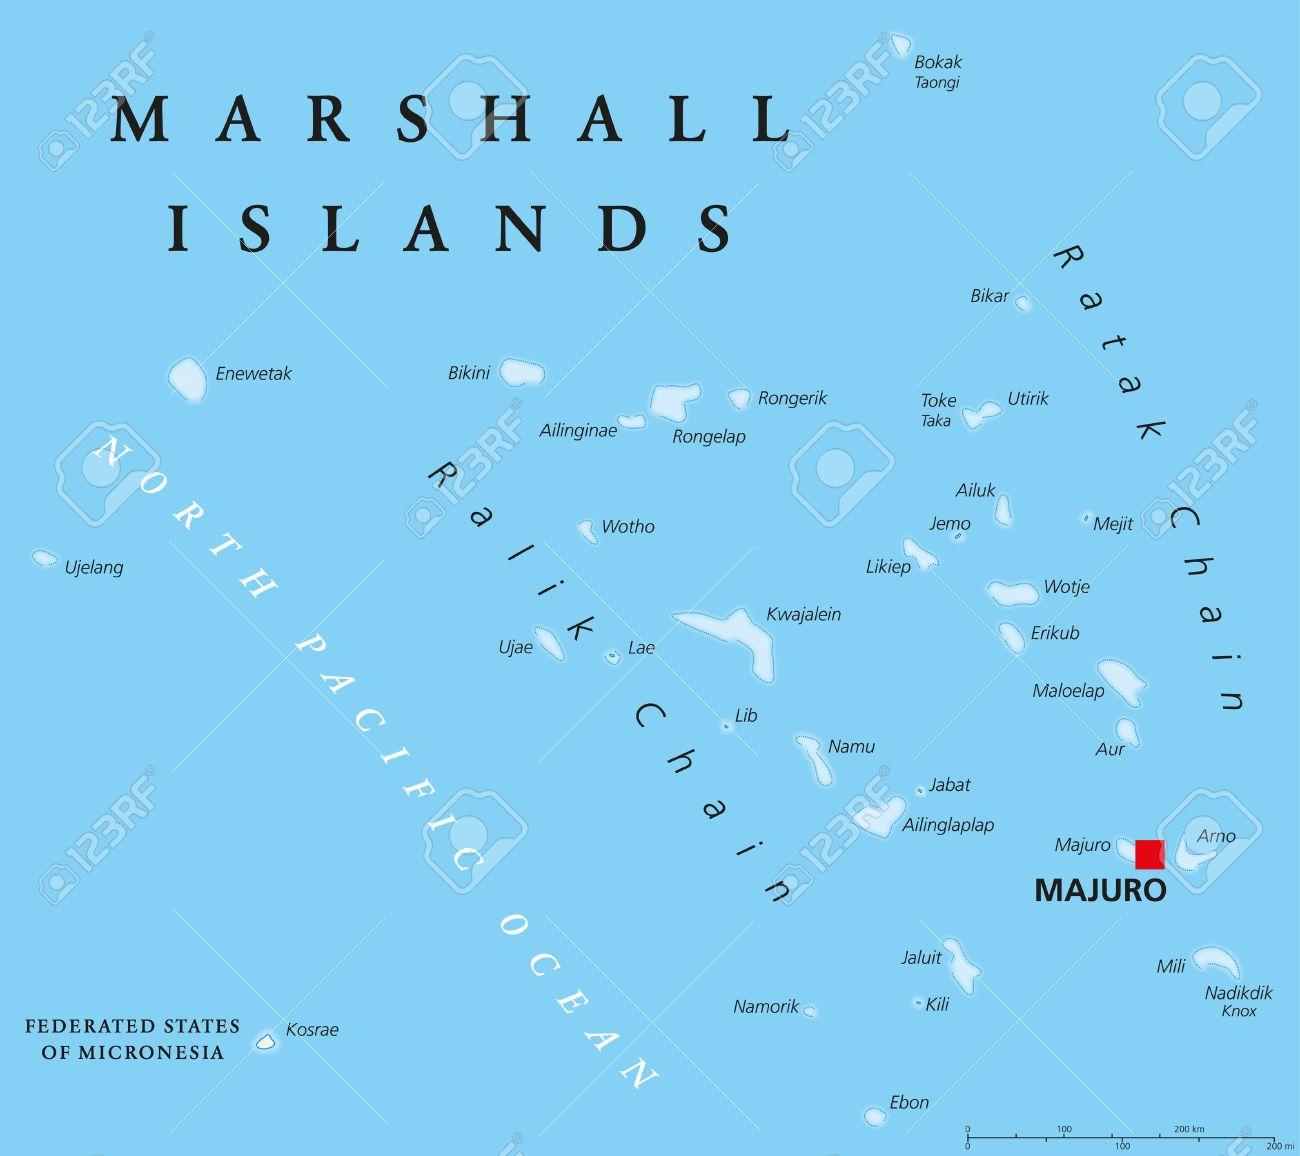 Marshall Islands political map with capital Majuro. Republic.. on kiribati map, tuvalu map, united arab emirates map, el salvador map, marshall islands map, mayotte map, bangladesh map, sri lanka map, senegal map, cook islands map, gambia map, cayman islands map, burkina faso map, costa rica map, india map, papua new guinea map, congo map, saudi arabia map, greenland map, hungary map,